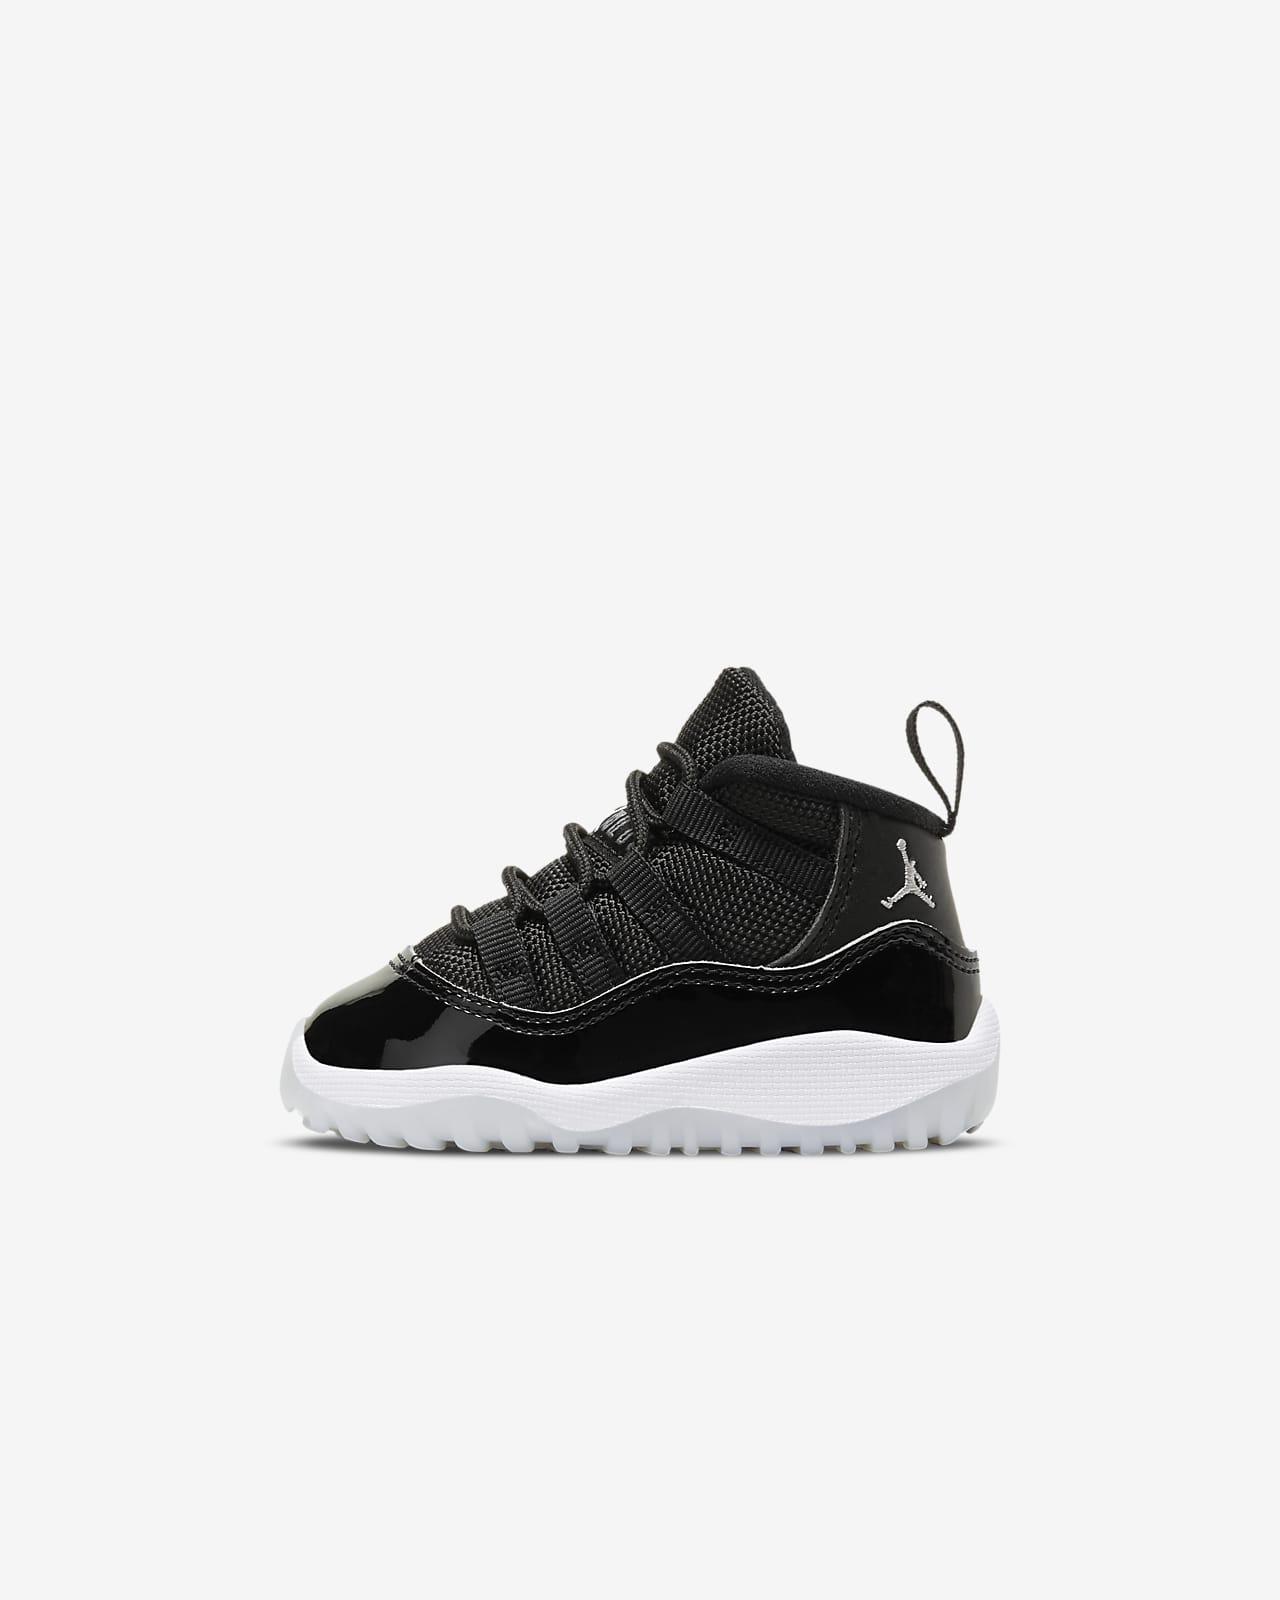 Jordan 11 Retro (TD) 复刻婴童运动童鞋